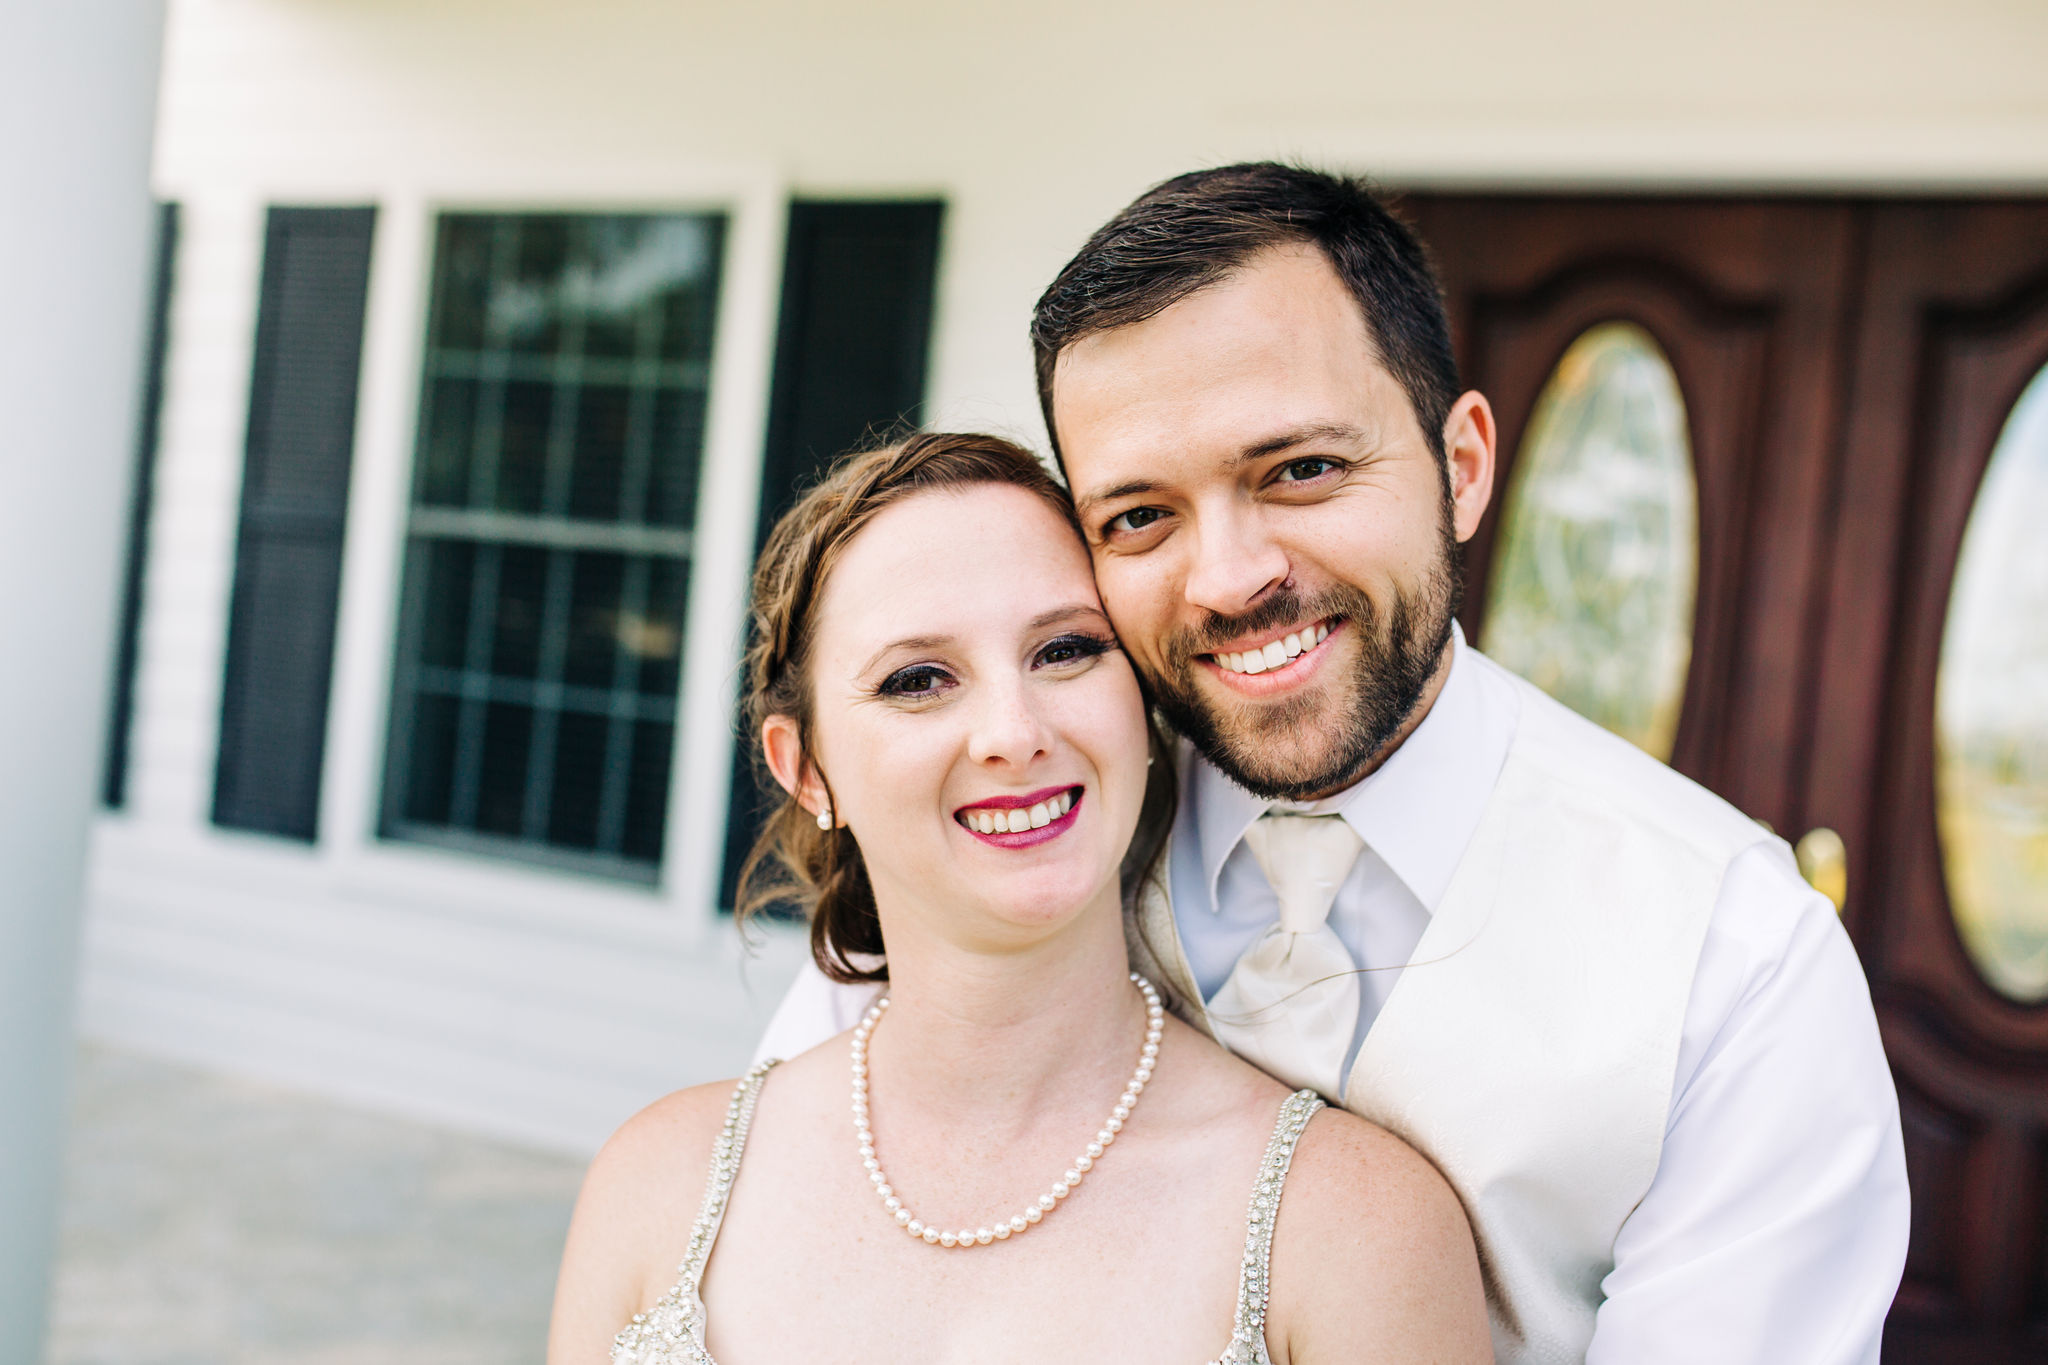 arundel estates sorrento florida wedding planner